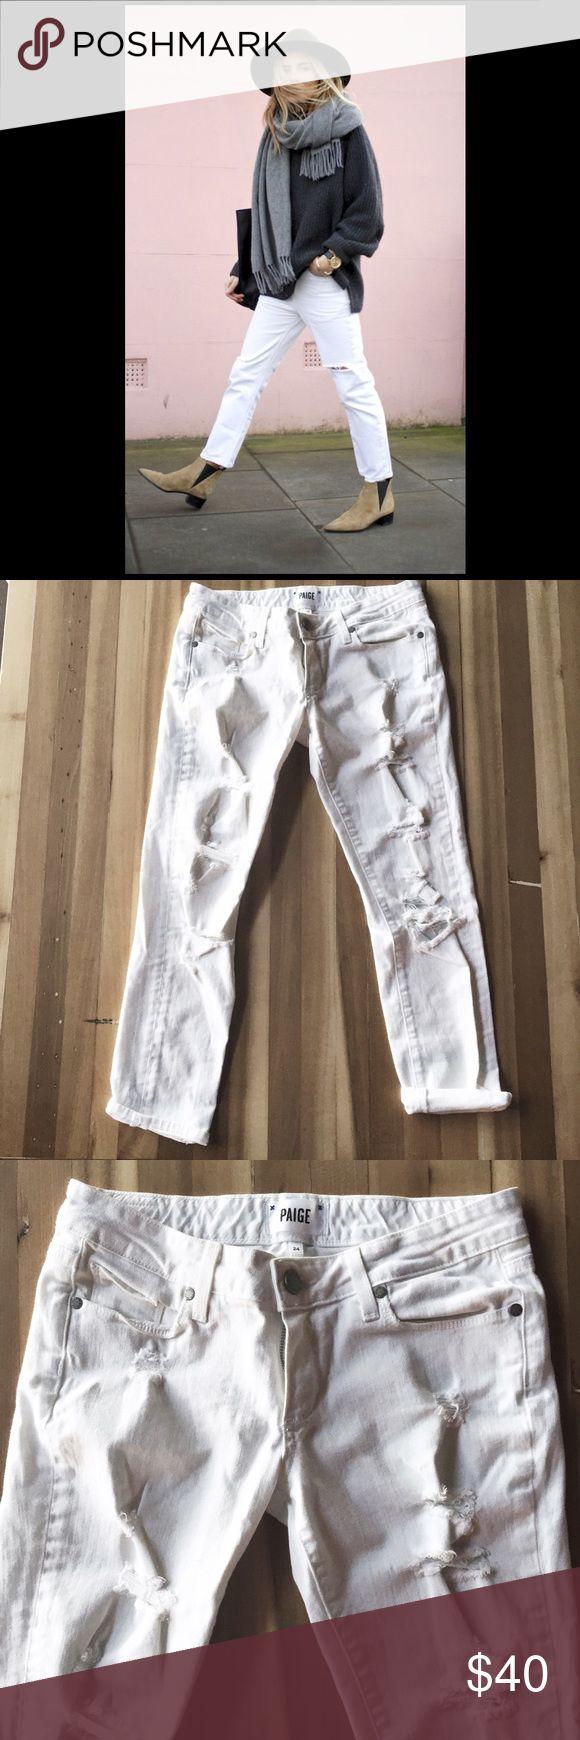 "✖️SALE✖️Paige 'Jimmy Jimmy' Jean Distressed winter white boyfriend denim, measurements: waist across 14"", rise 7.5"", inseam 26"", first pic for styling purposes only Paige Jeans Jeans Boyfriend"